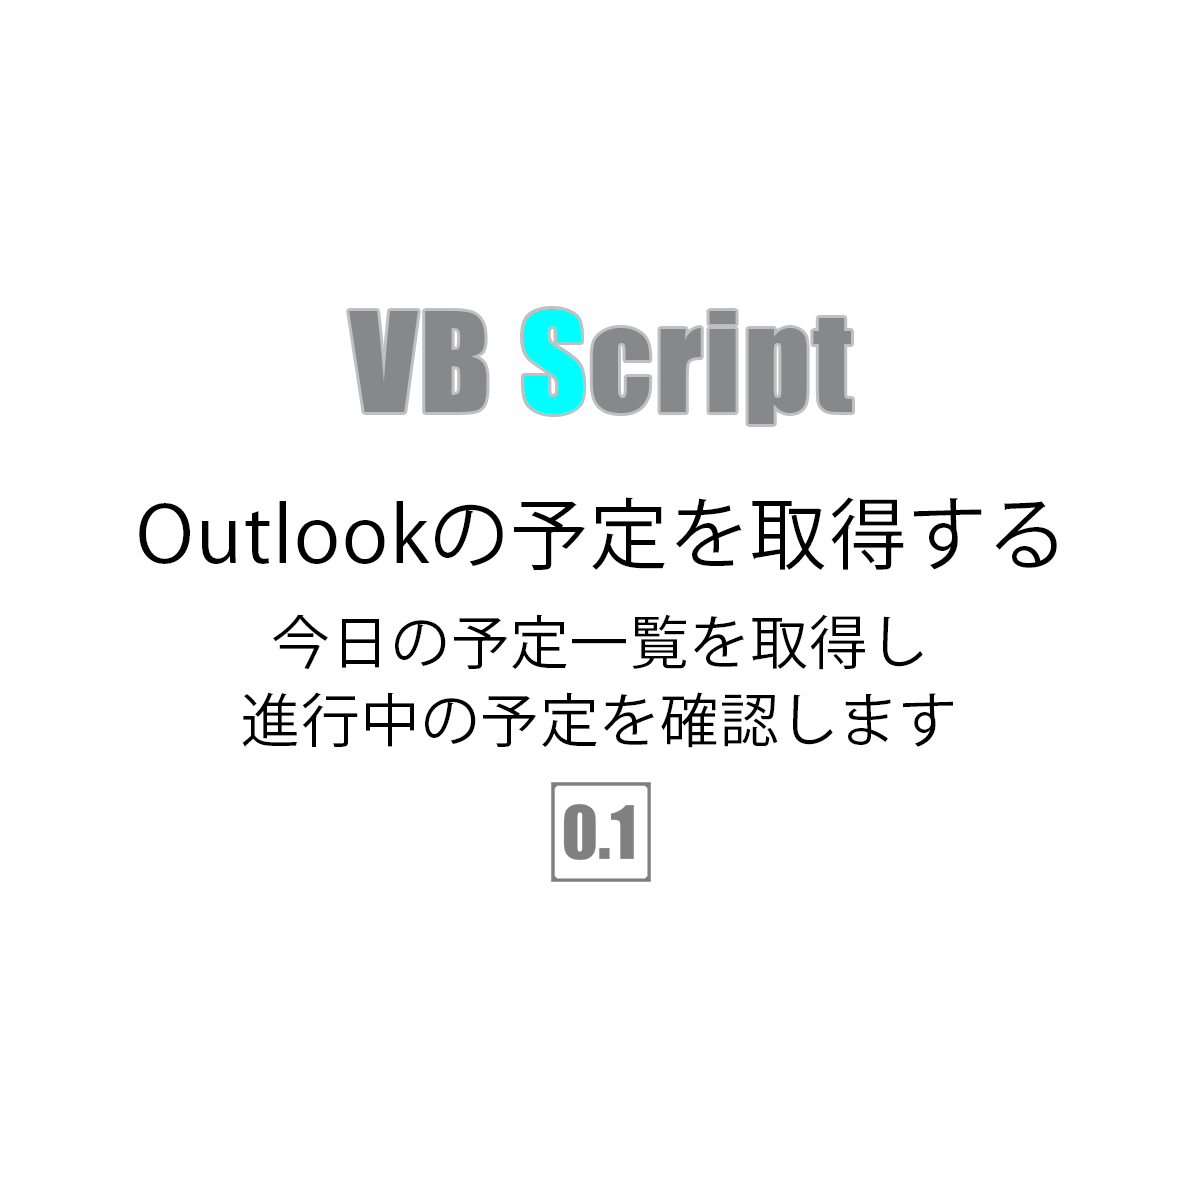 Outlookの今日の予定一覧をVBS取得し、進行中の予定を確認する